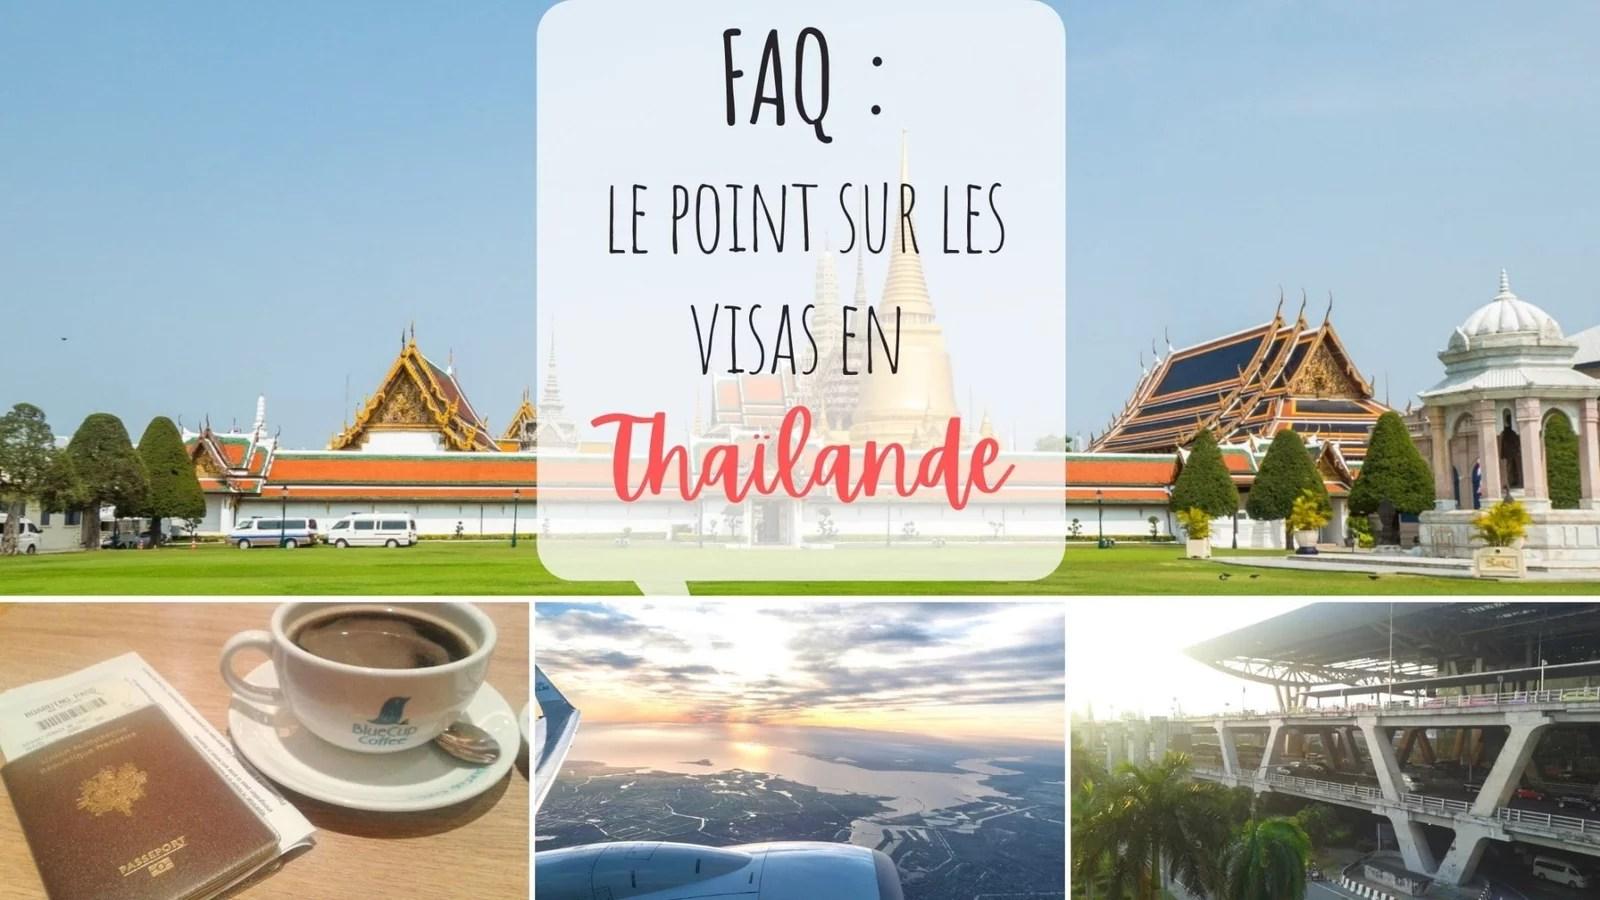 FAQ visas touristique en Thailande